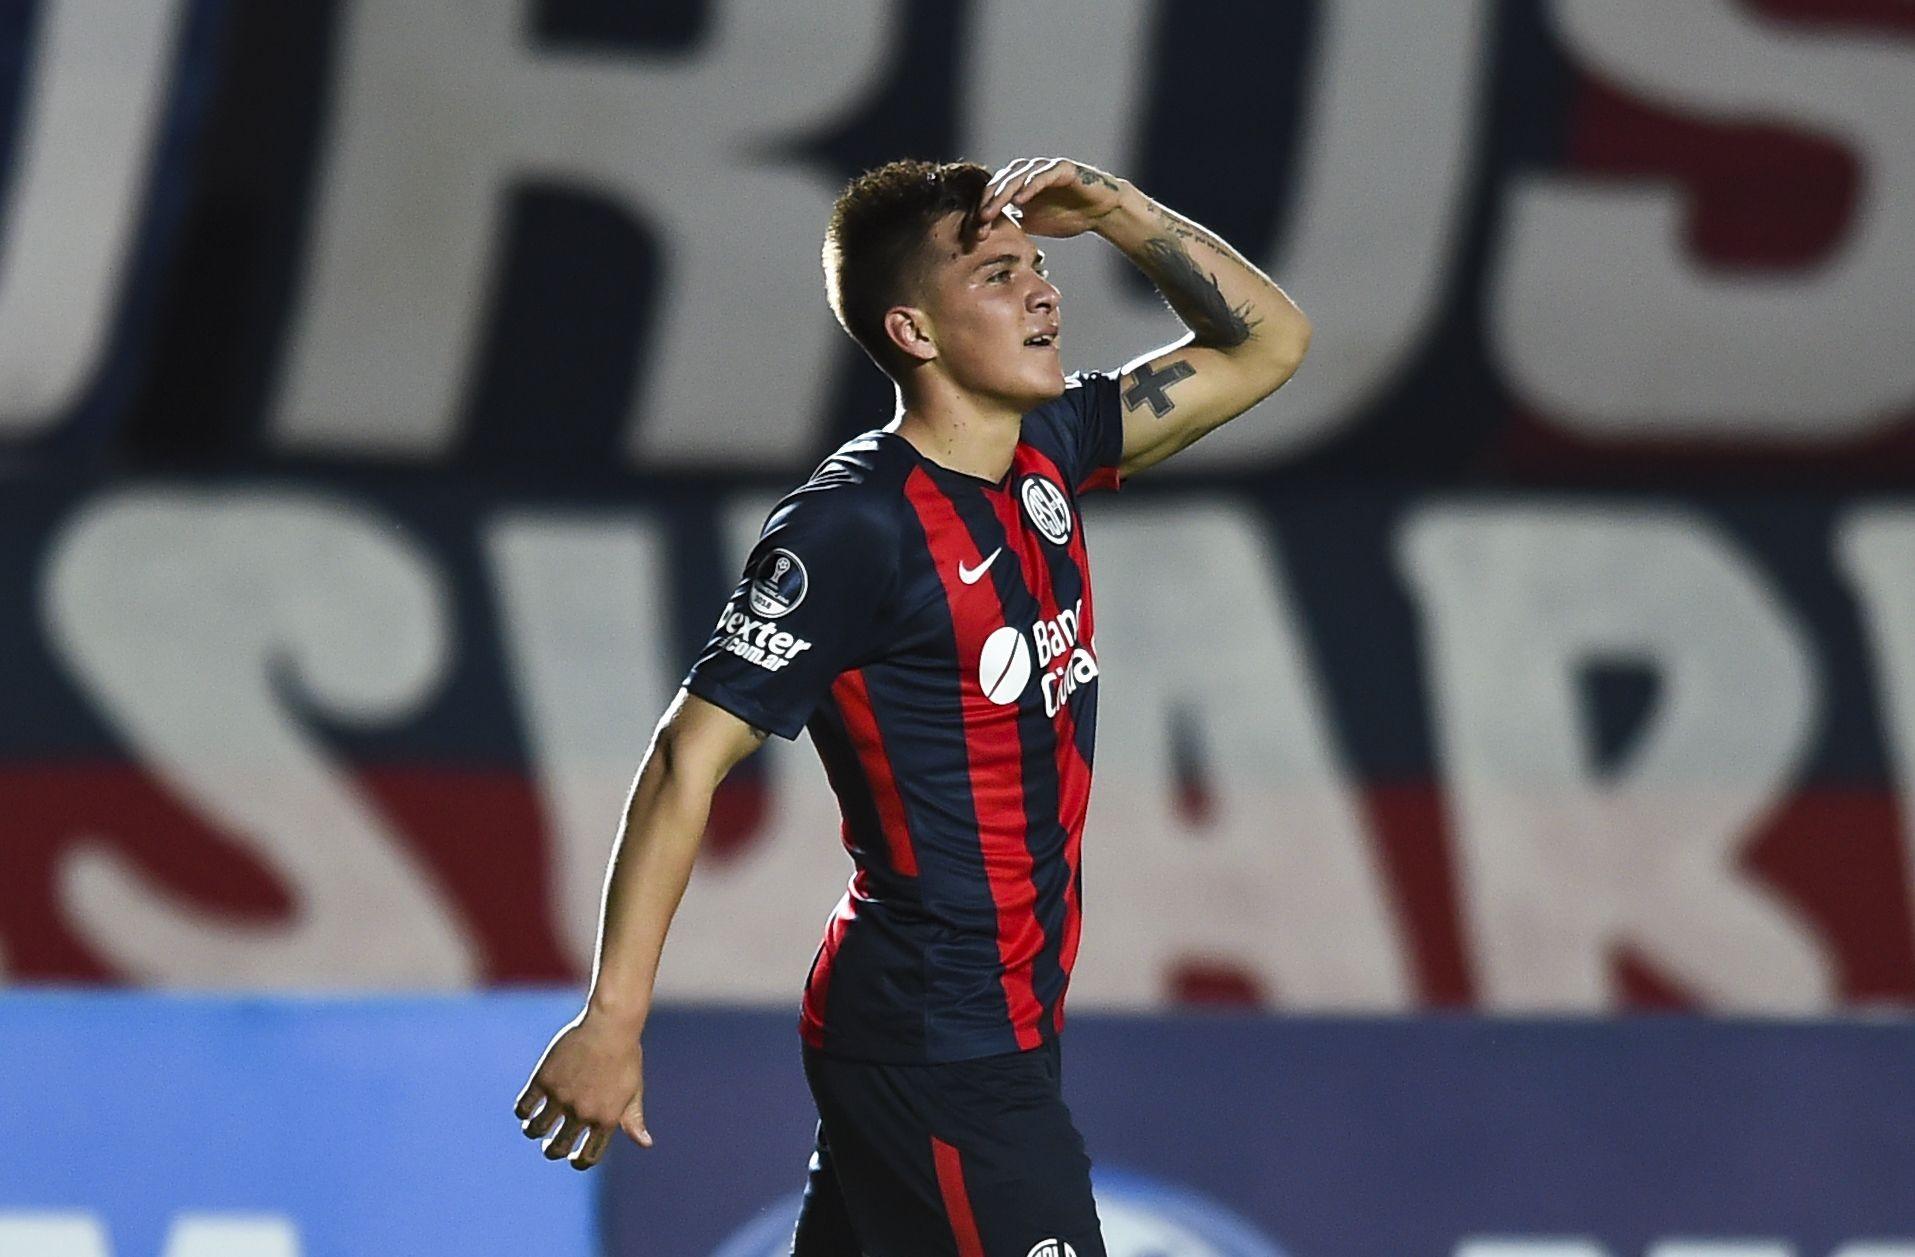 ¿C³mo continºa la undécima fecha de la Superliga